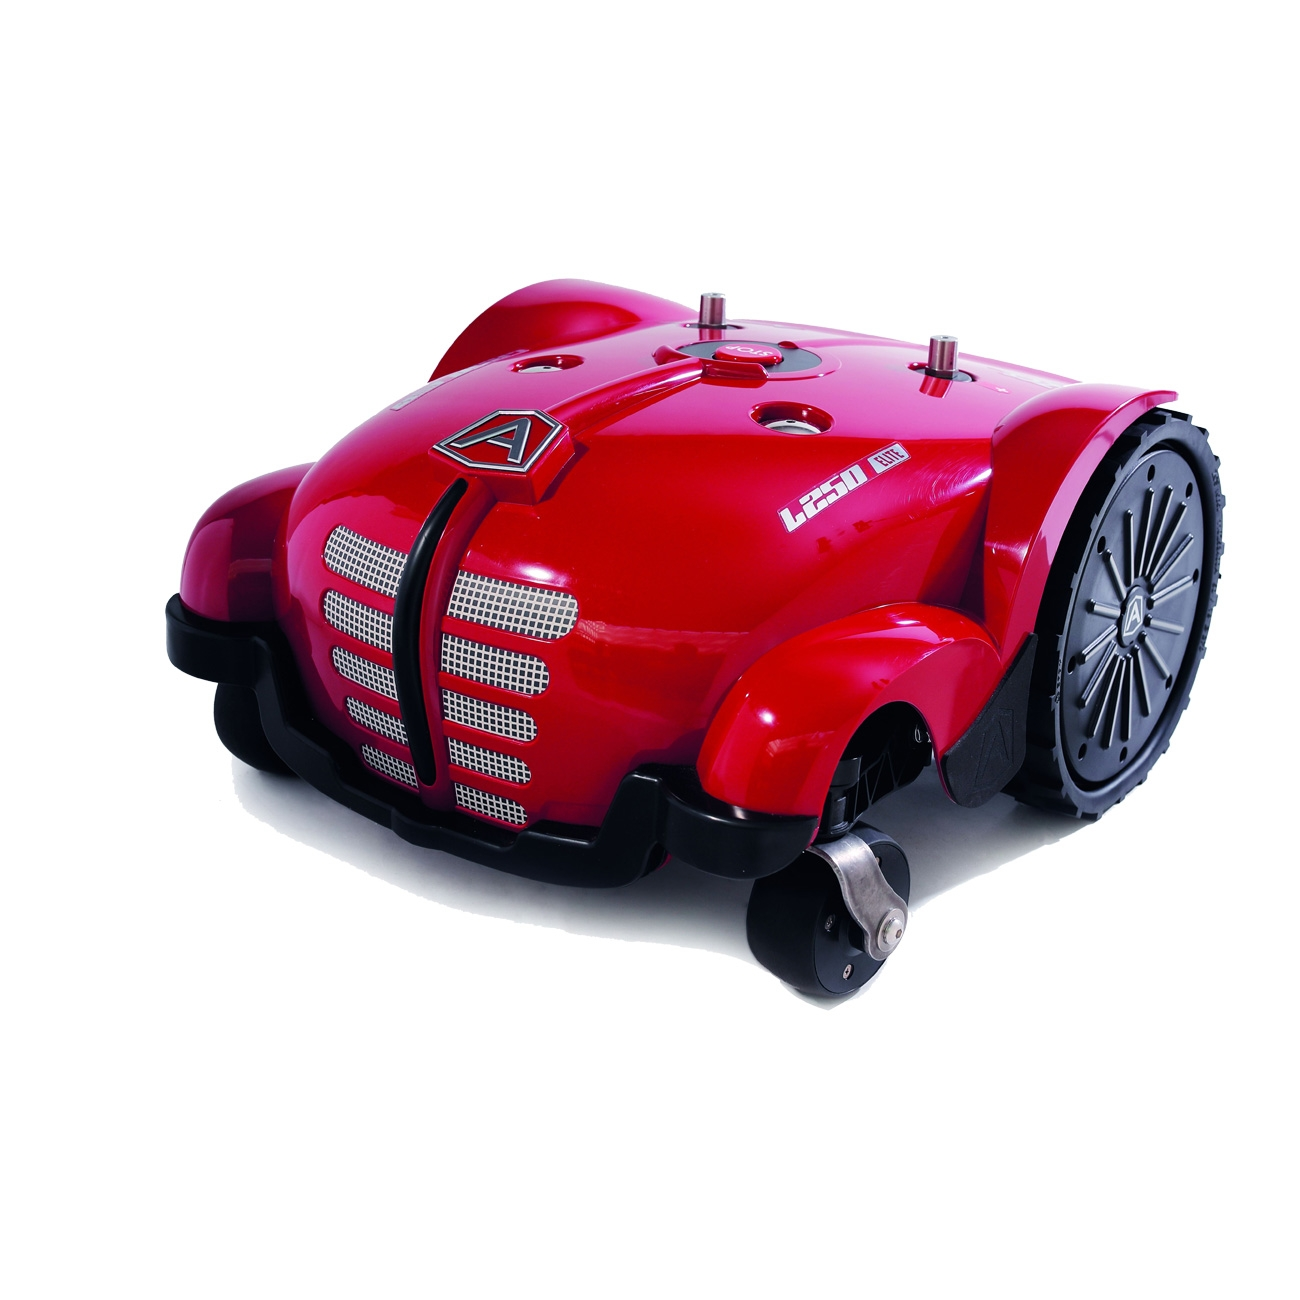 Image of Ambrogio Robot L250i Elite PROline - Robot tagliaerba gps